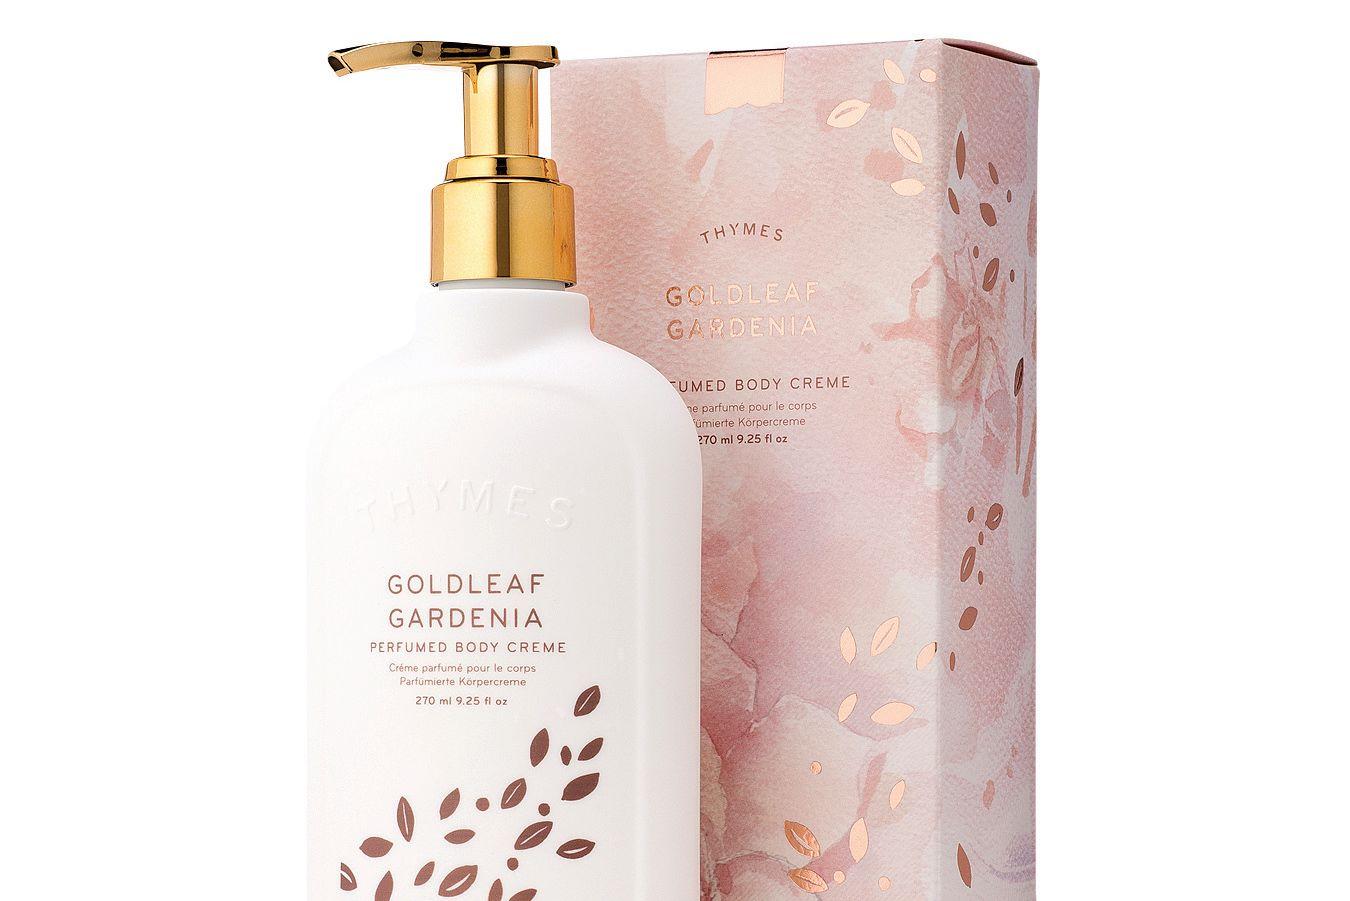 Goldleaf gardenia perfumed body creme e7p21h